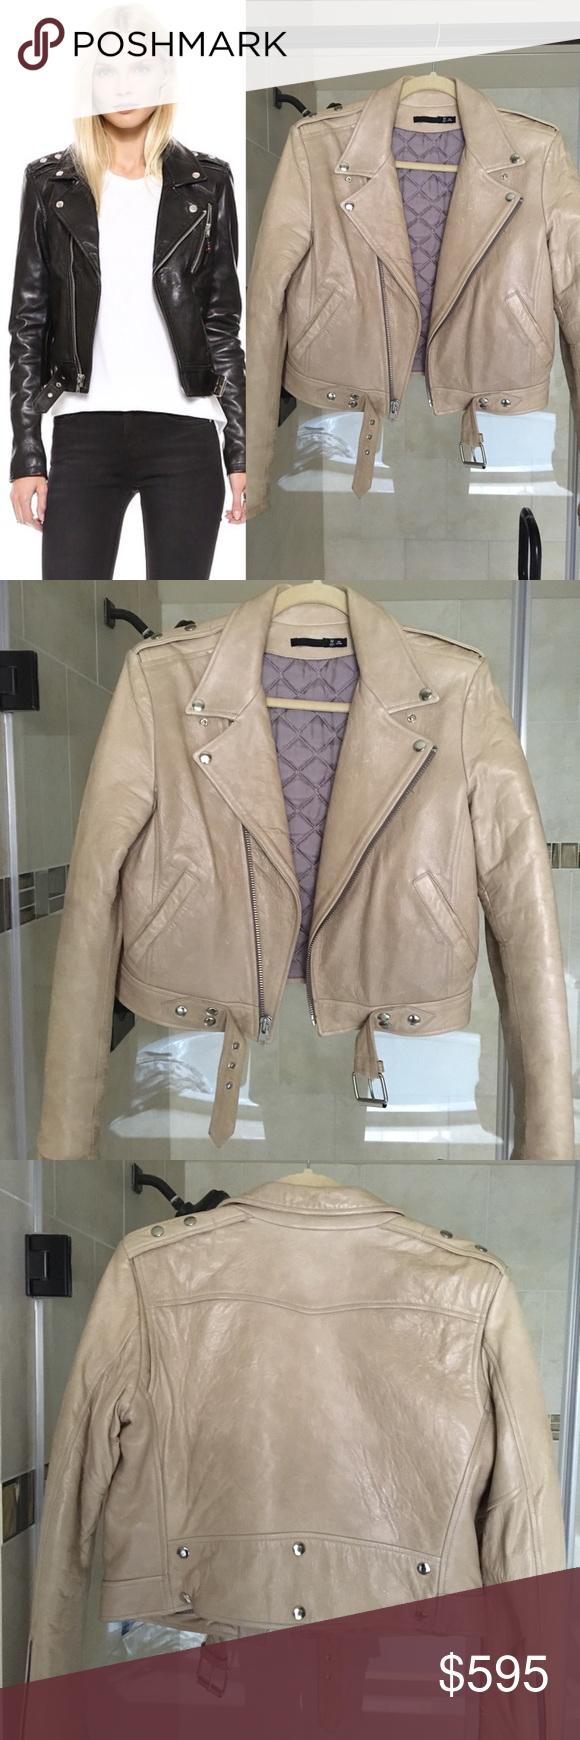 Blk Dnm Beige Leather Jacket Beige Leather Jacket Olive Green Leather Jacket Blk Dnm Leather Jacket [ 1740 x 580 Pixel ]